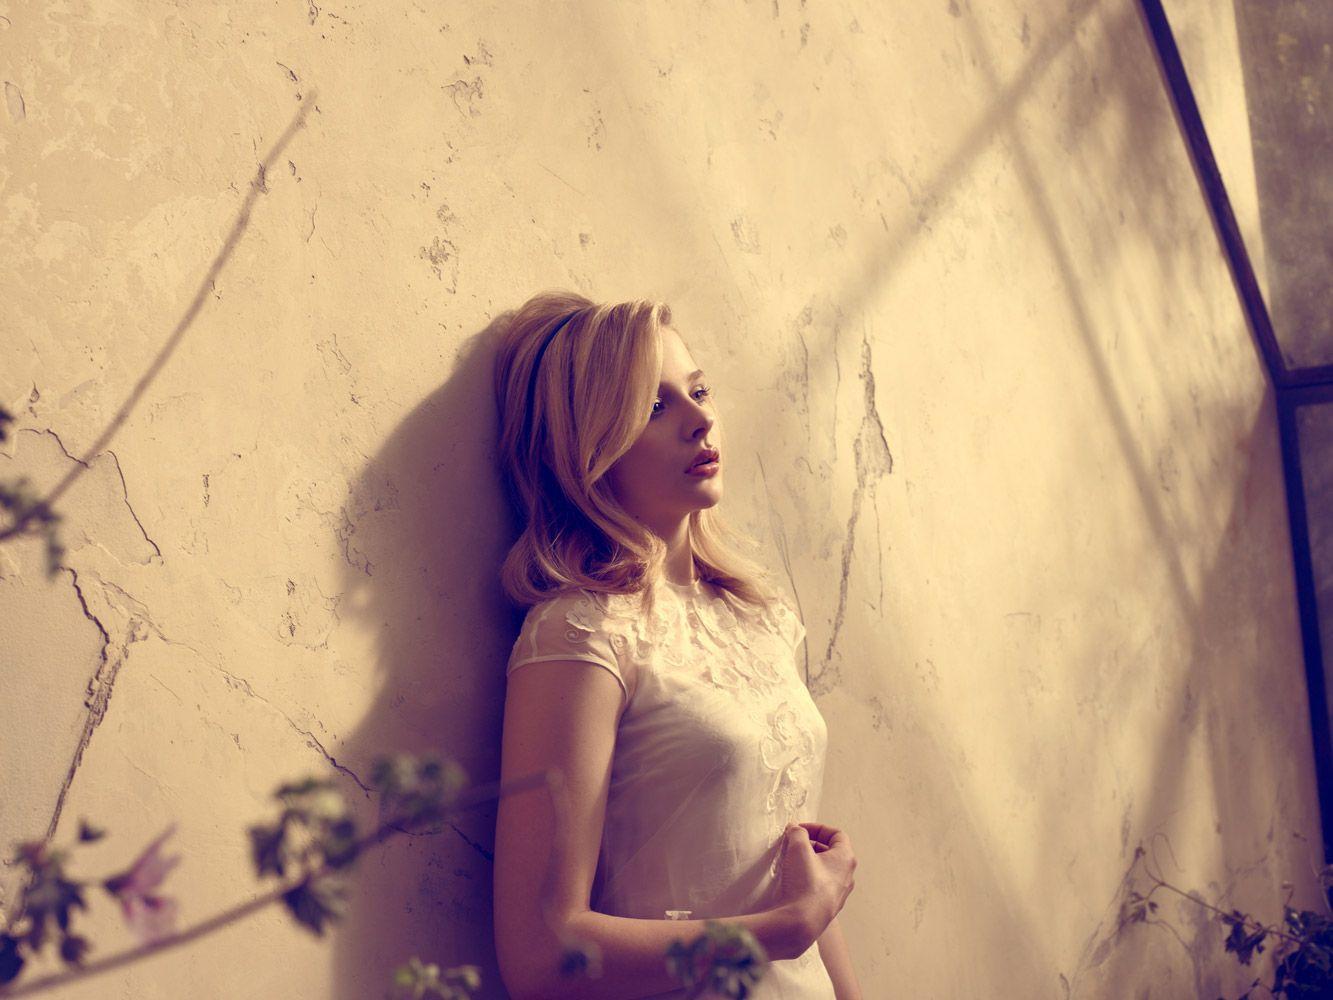 Datk Shadows Woman Portrait - Chloe Moretz Photo (31073505 ...